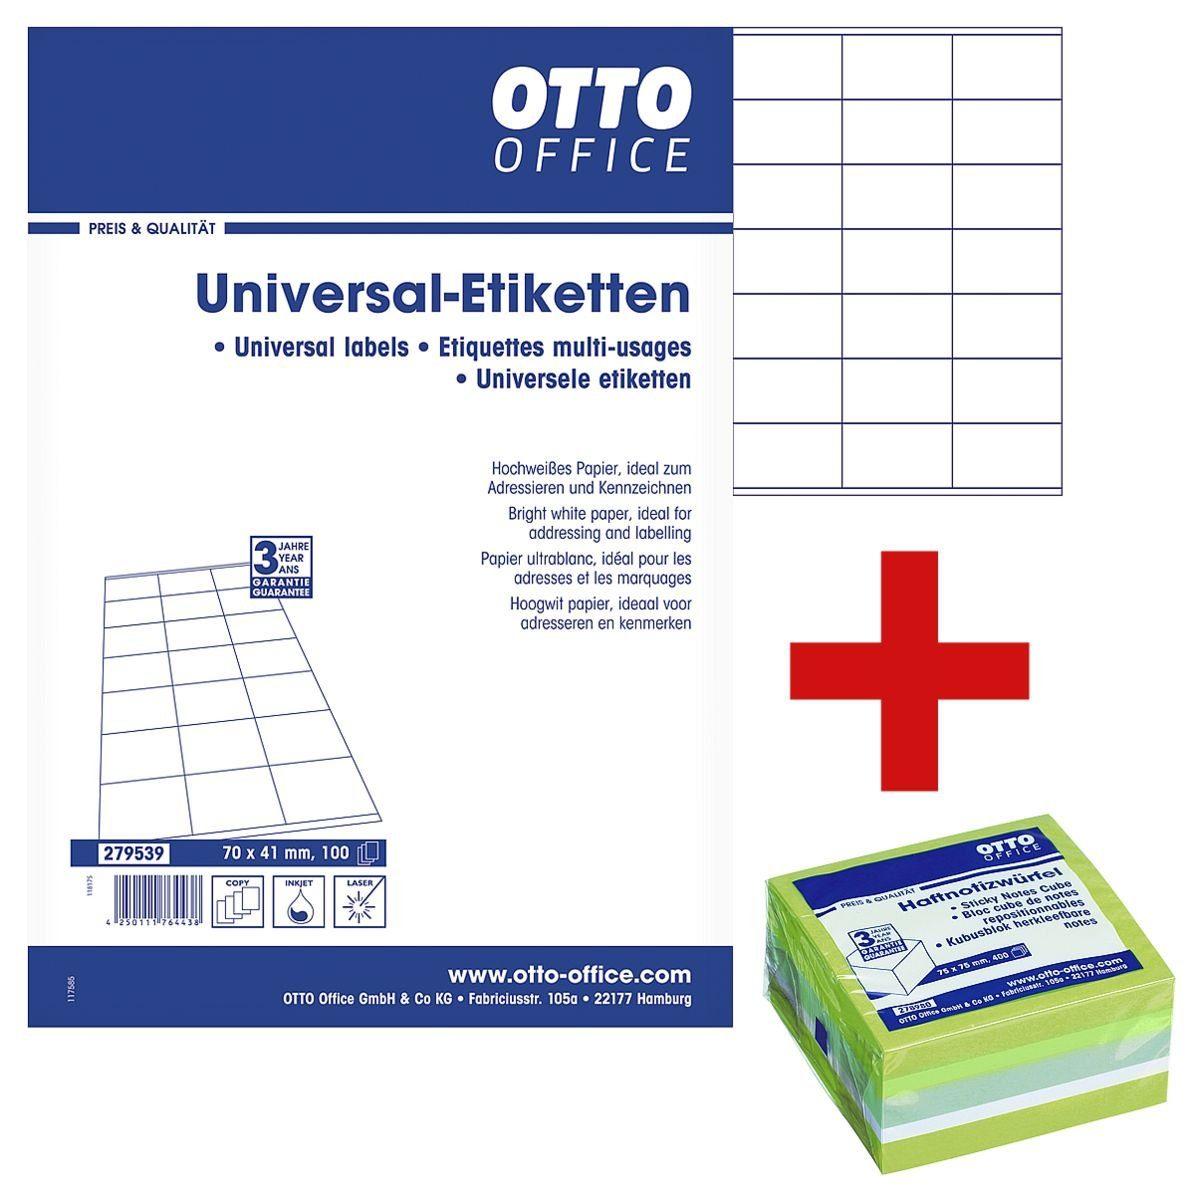 OTTO Office Standard 2100er-Pack Universal Klebeetiketten inkl. Haftnotizwürfel 1 Set